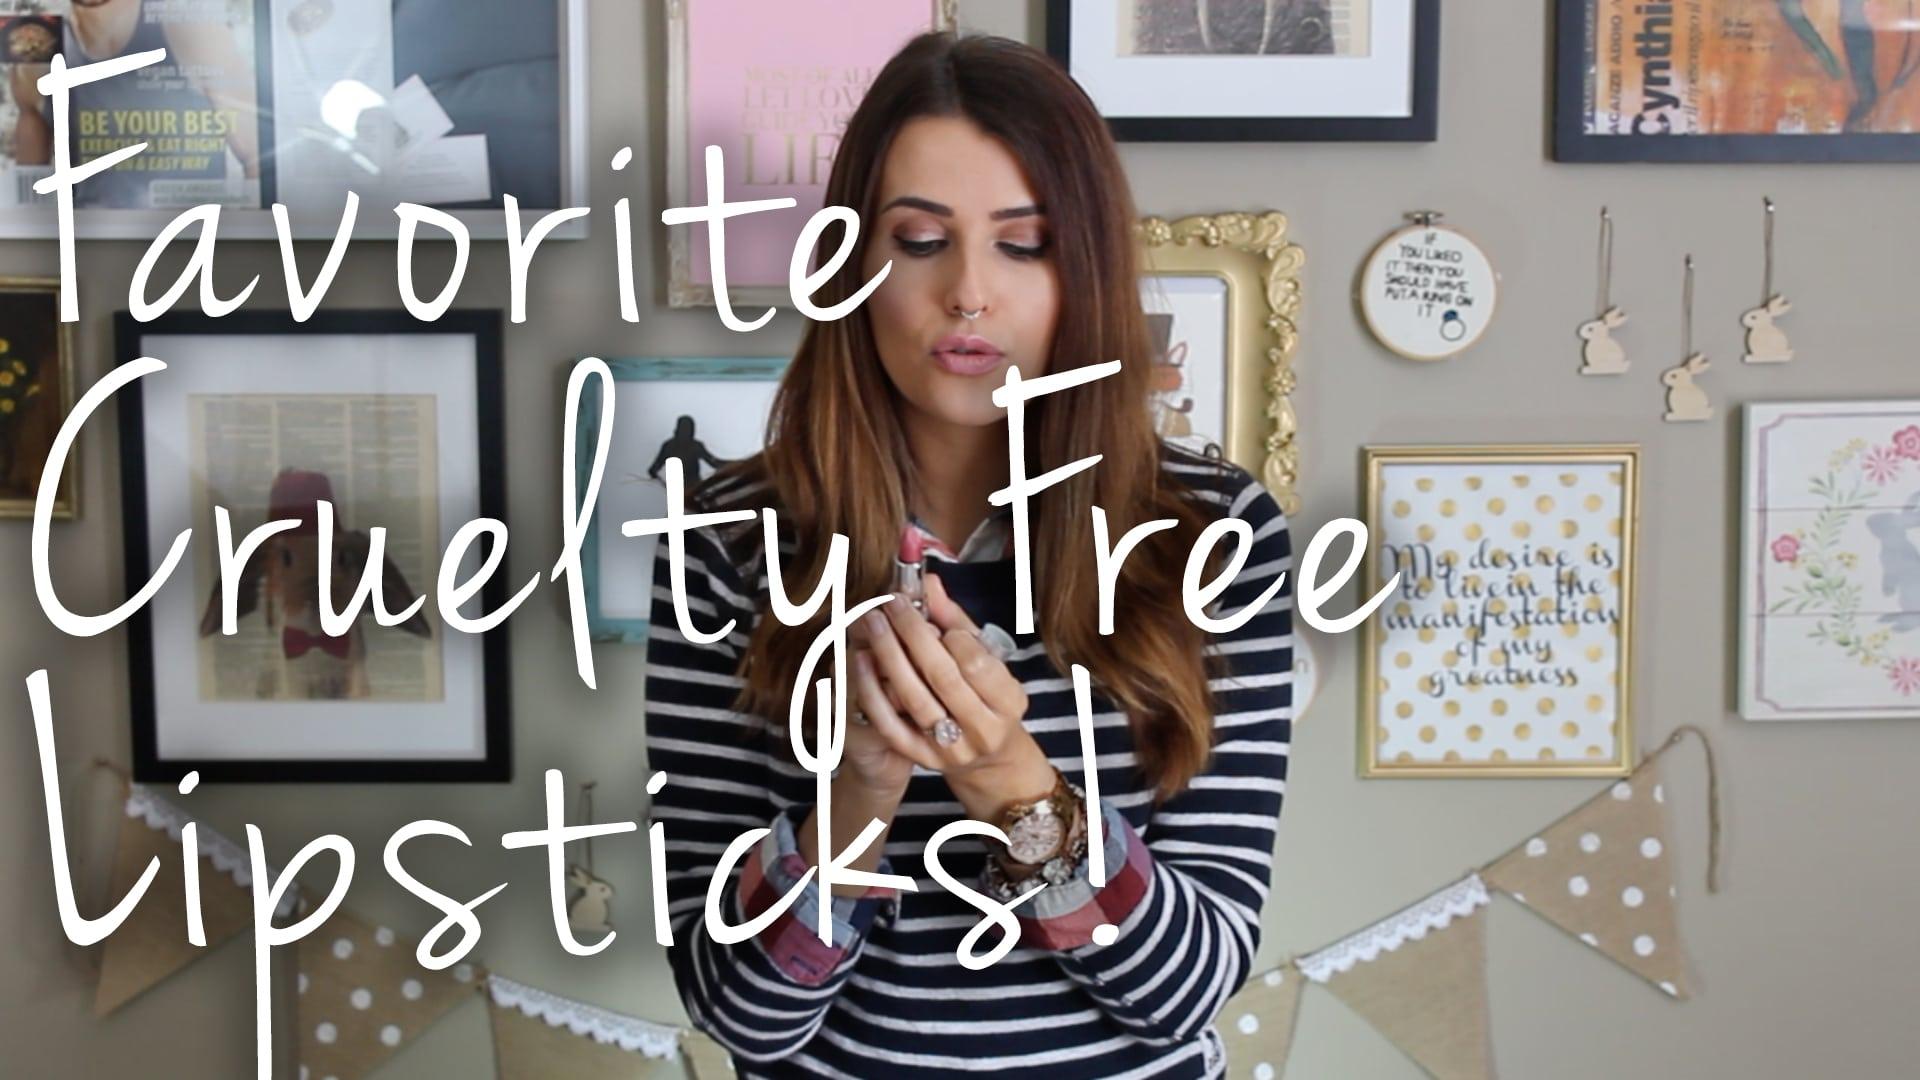 My Favorite Cruelty Free Lipstick Brands Video